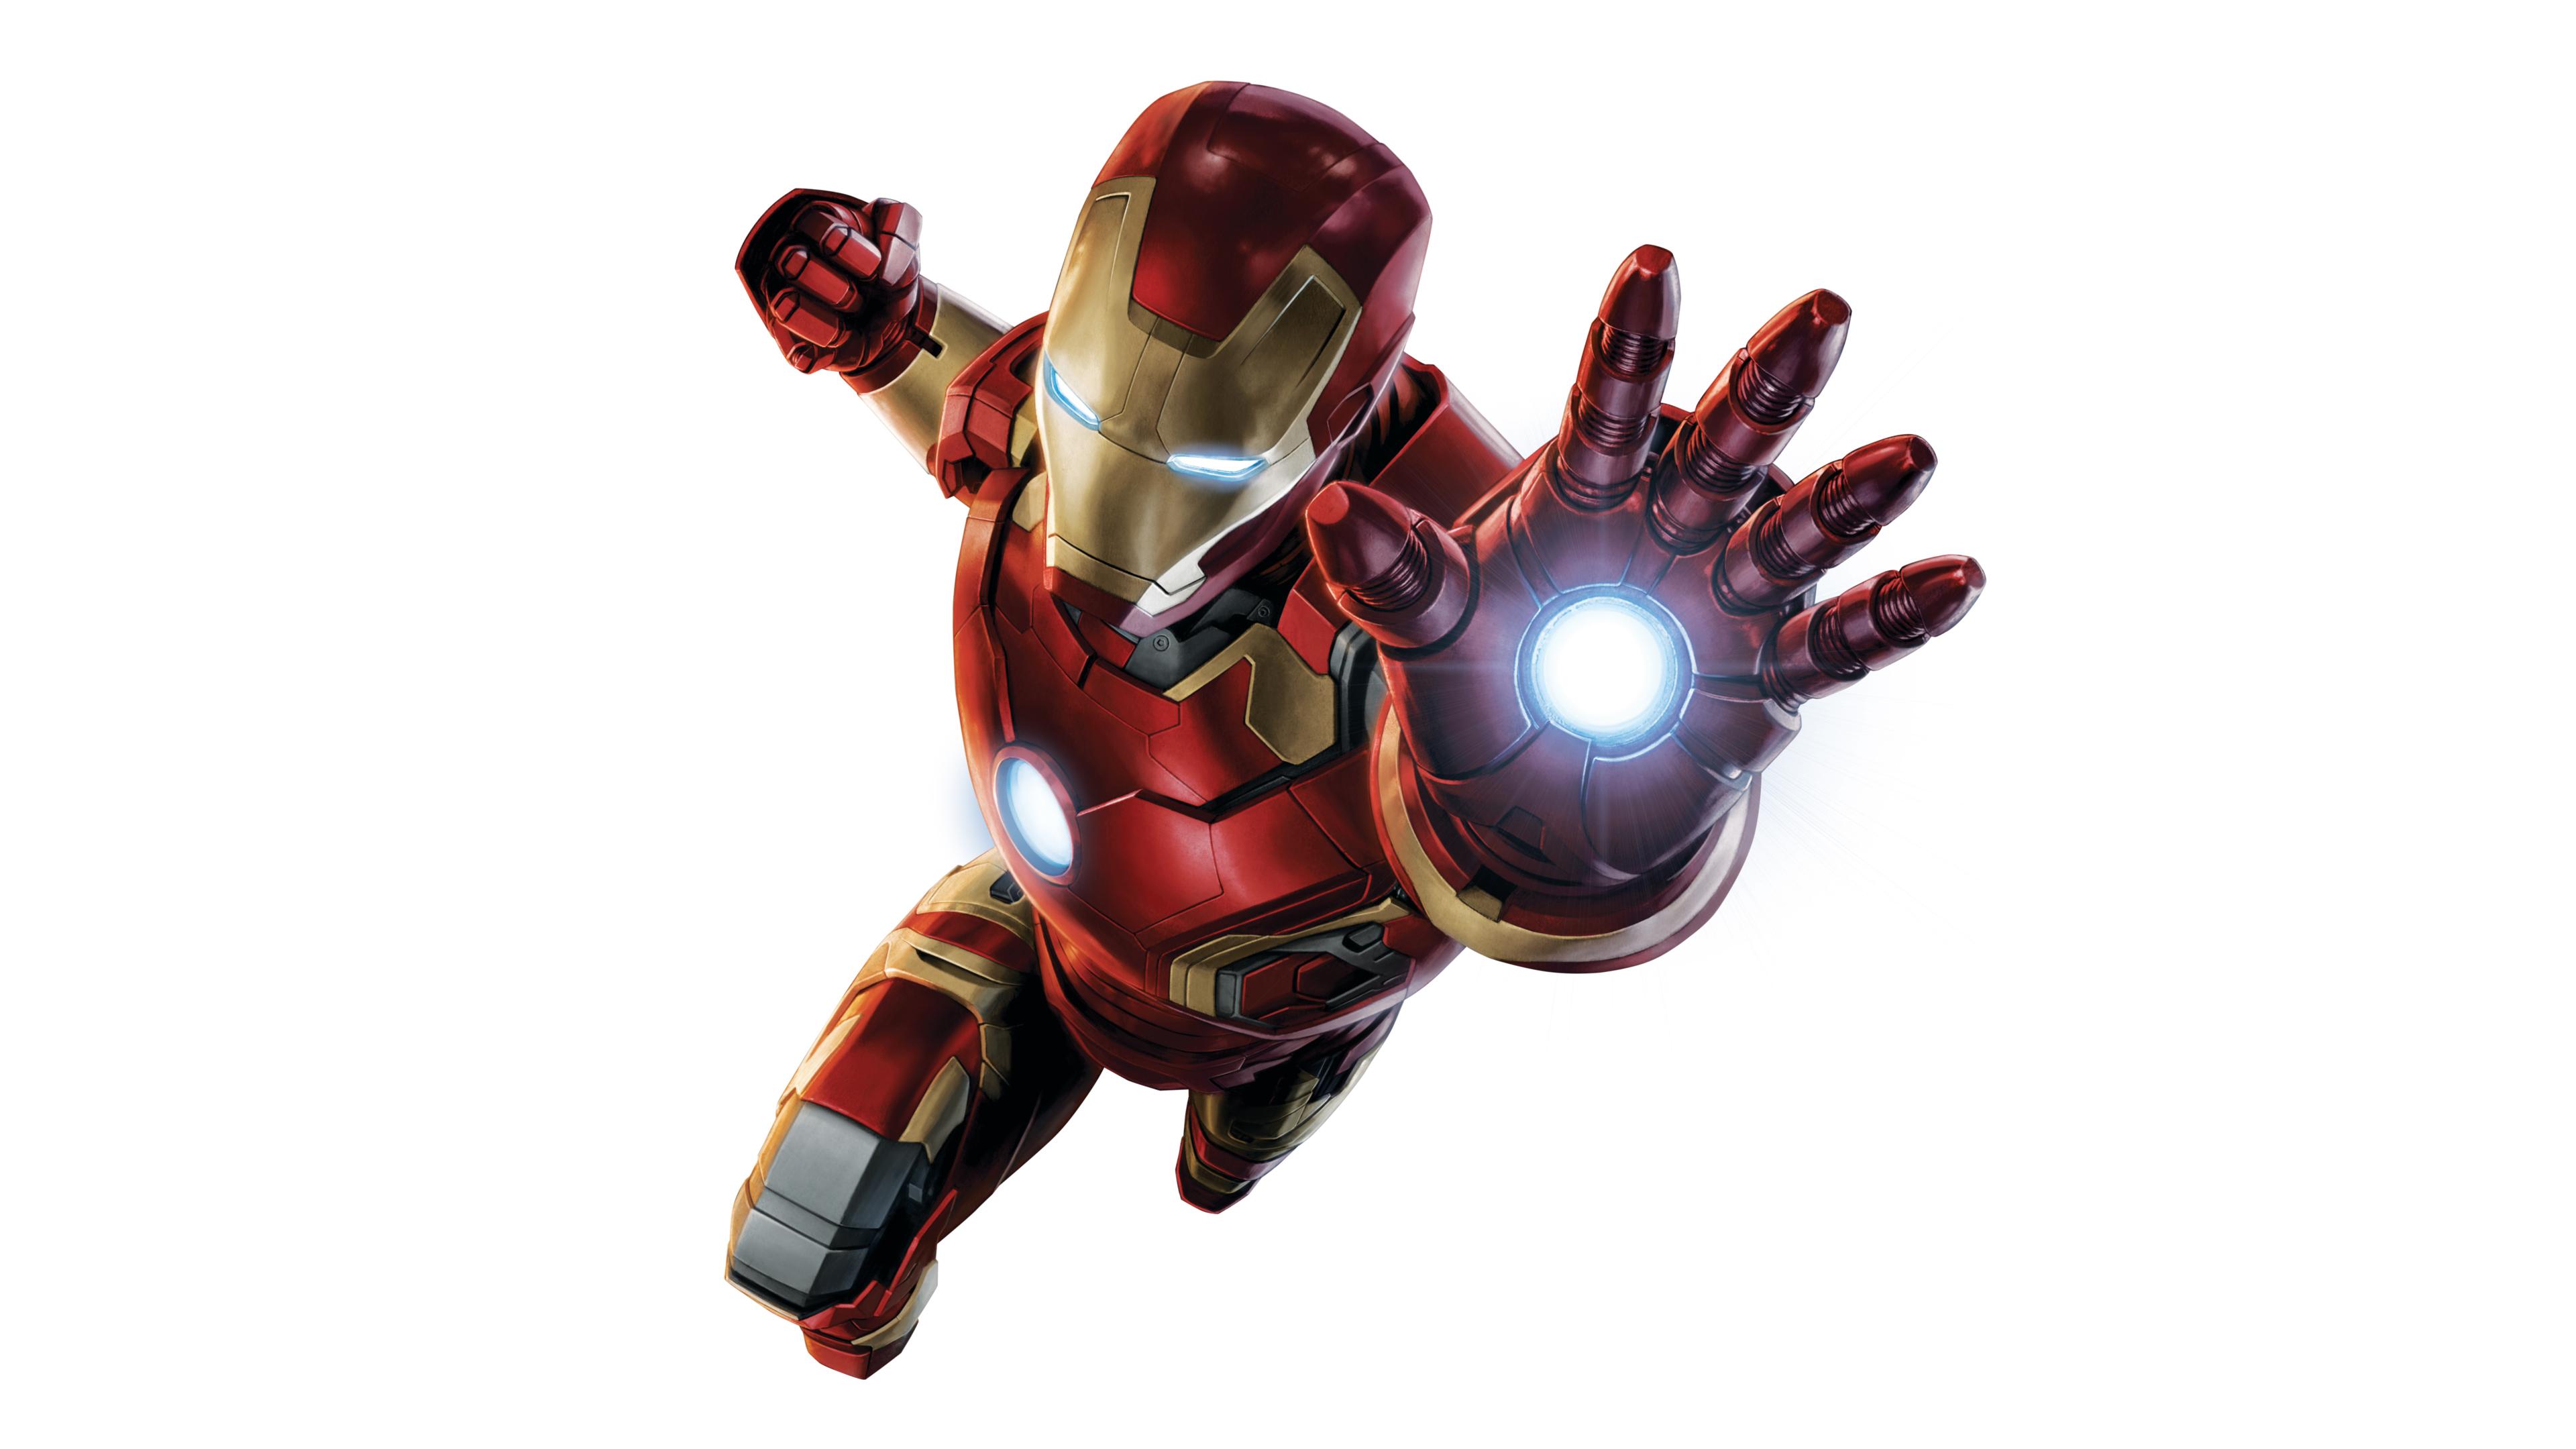 iron man 4k 2017 1536520125 - Iron Man 4k 2017 - superheroes wallpapers, iron man wallpapers, hd-wallpapers, 4k-wallpapers